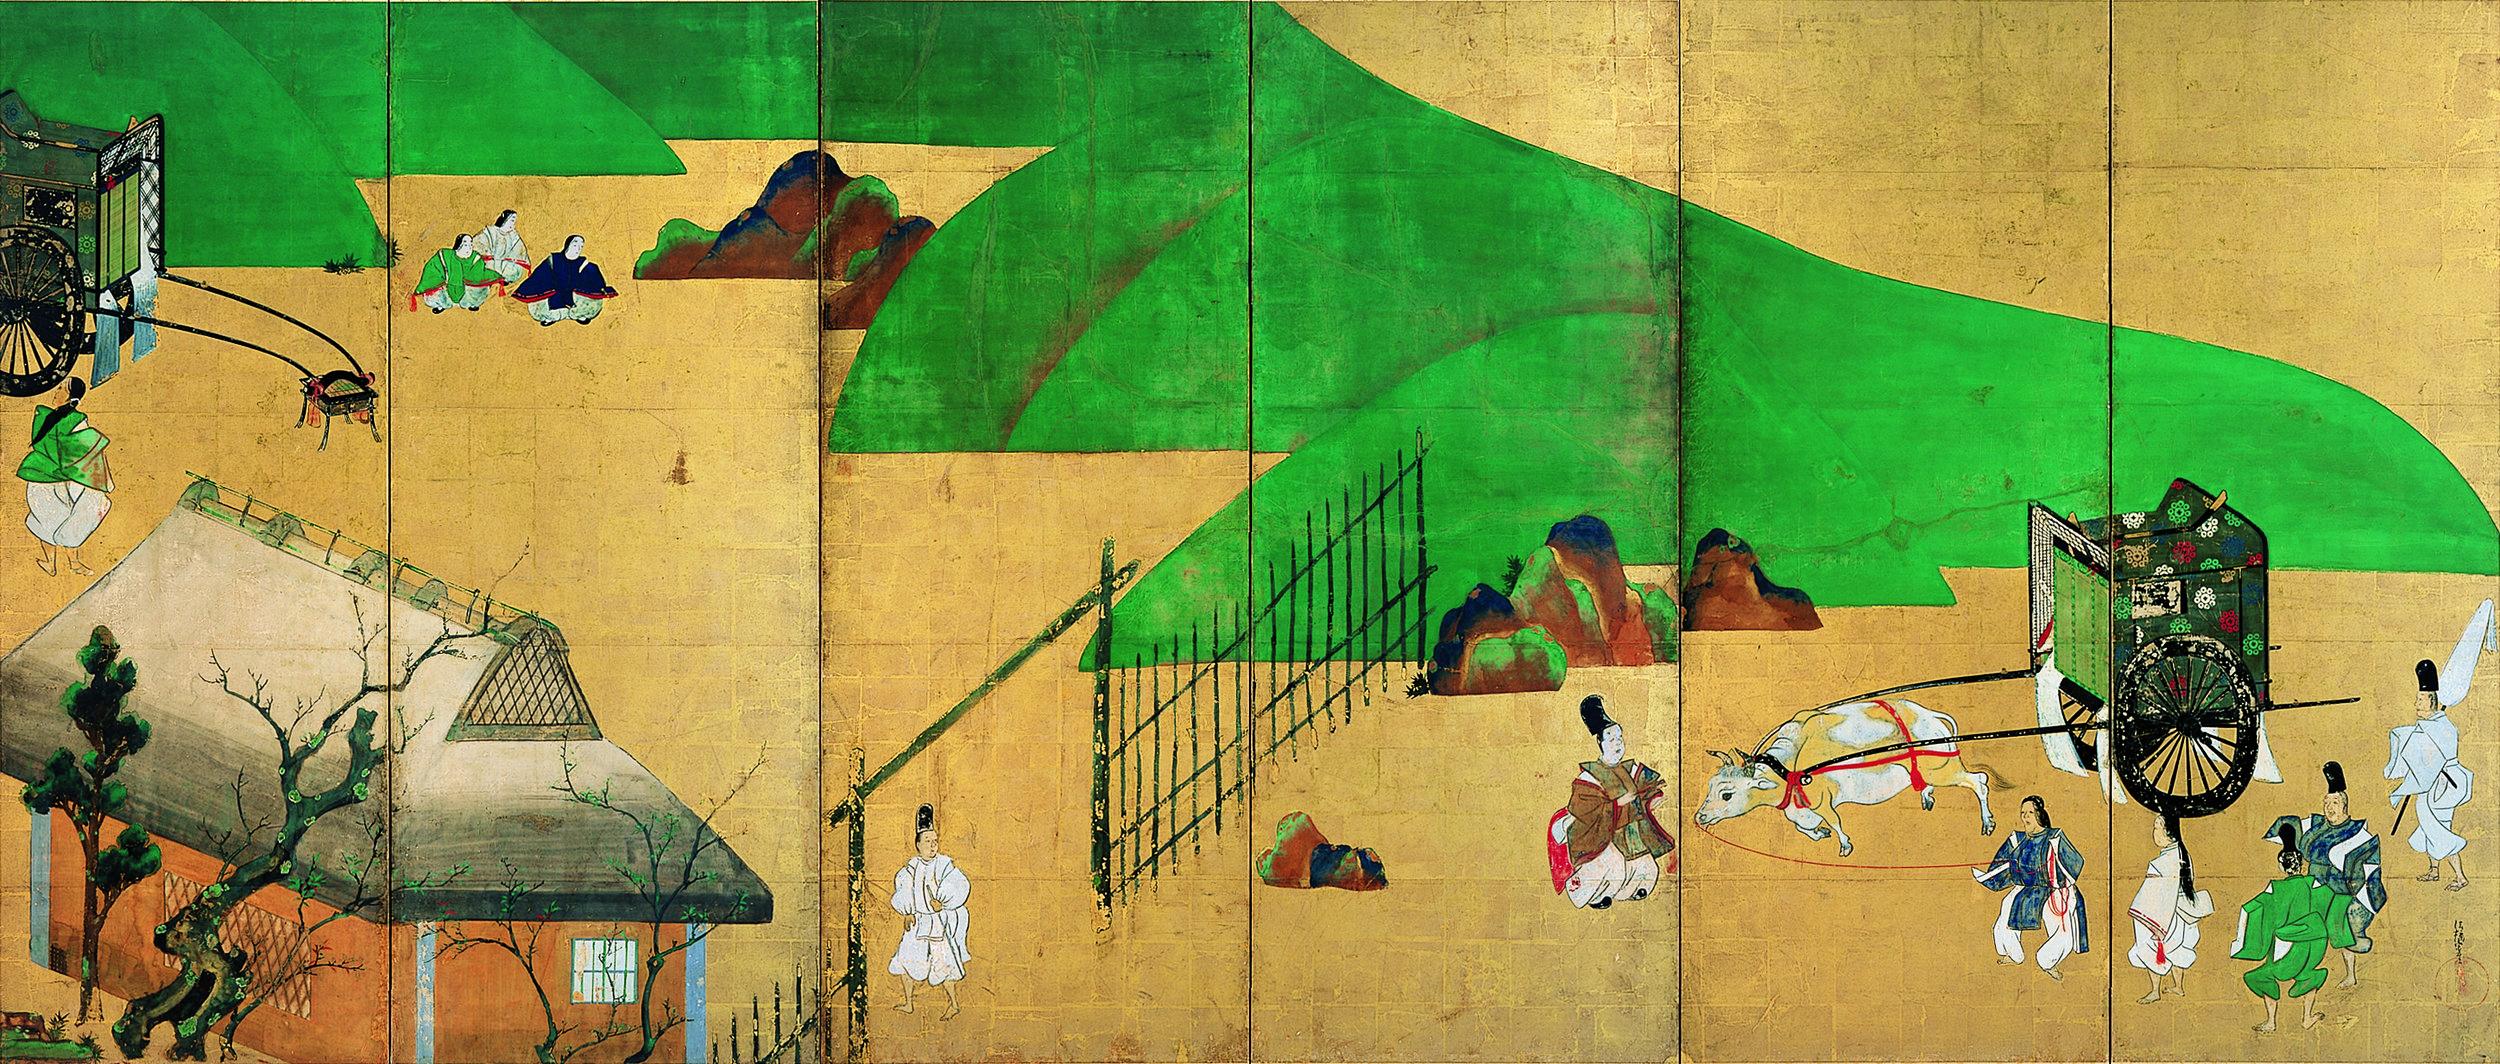 Tawaraya Sōtatsu, Japanese, died ca. 1643? Miotsukushi and Sekiya Japan, Edo period (1615–1868), 1631 Pair of six-panel folding screens